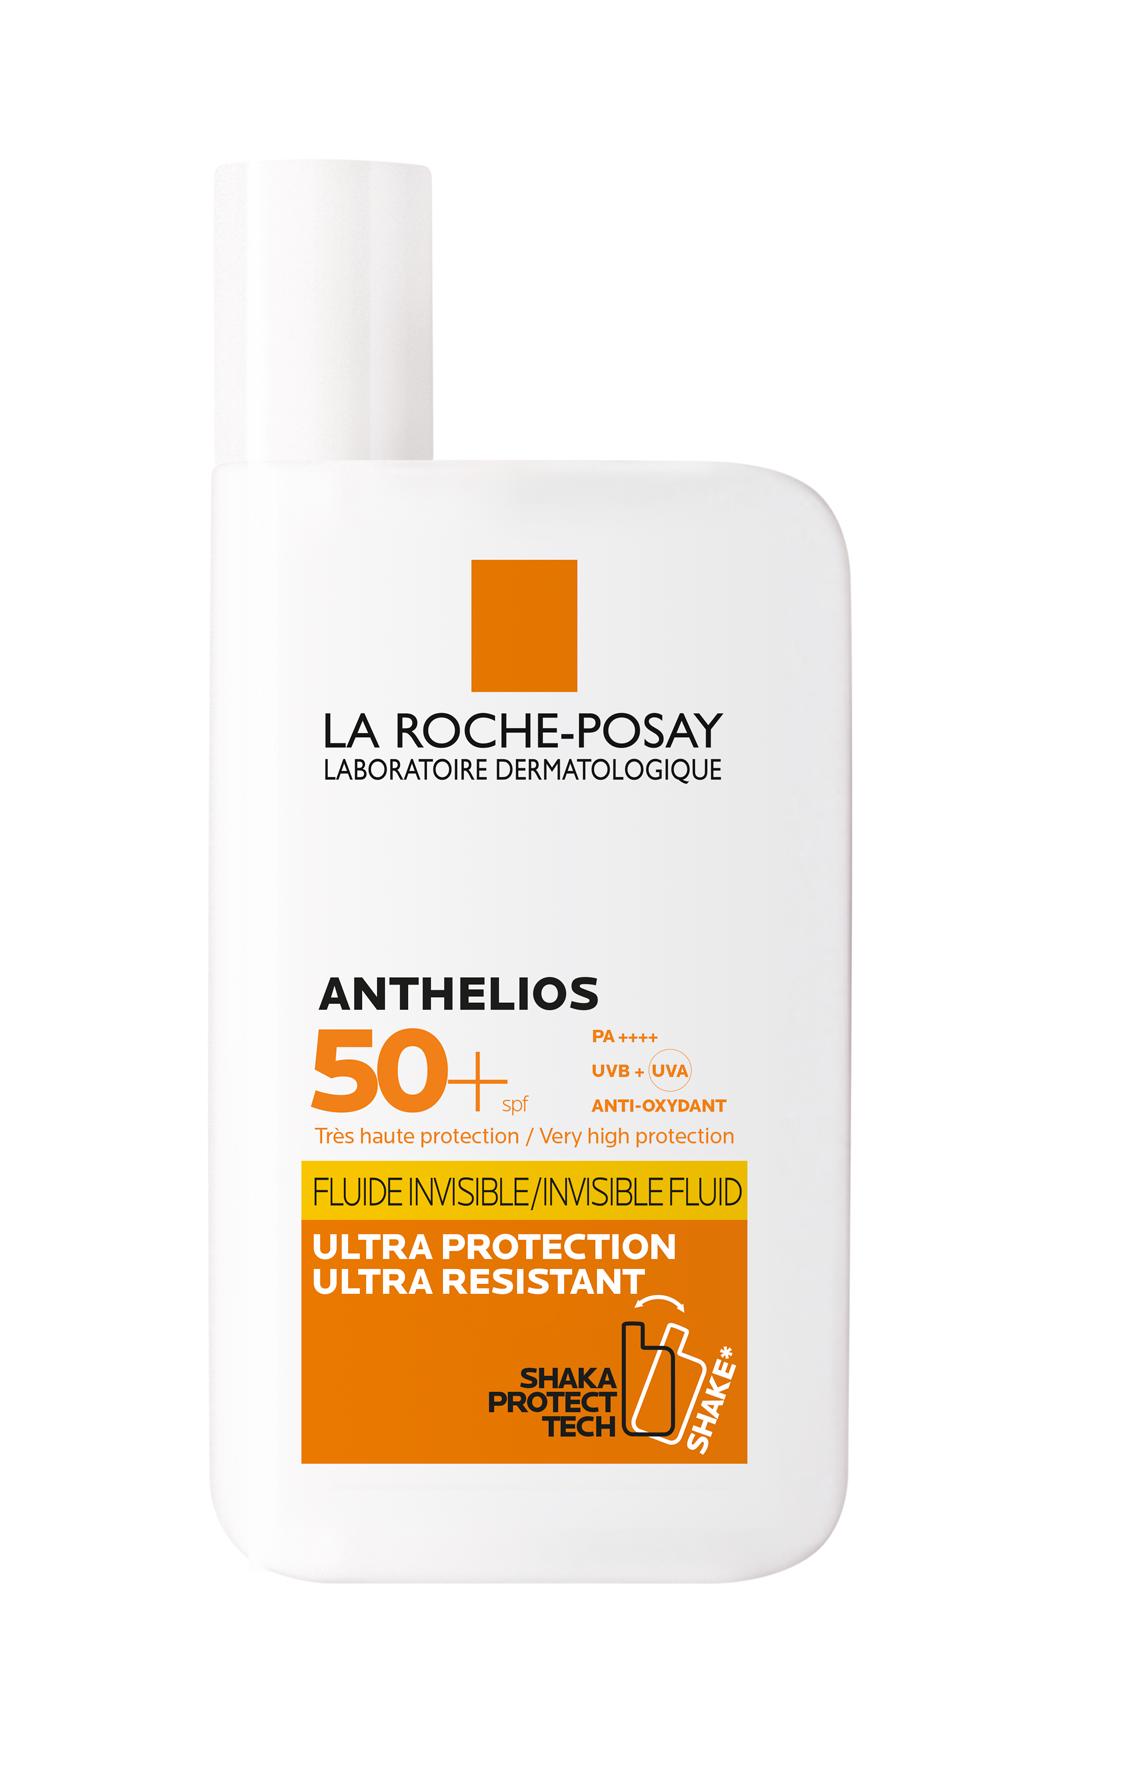 Image of Anthelios 50+ La Roche Posay 50ml